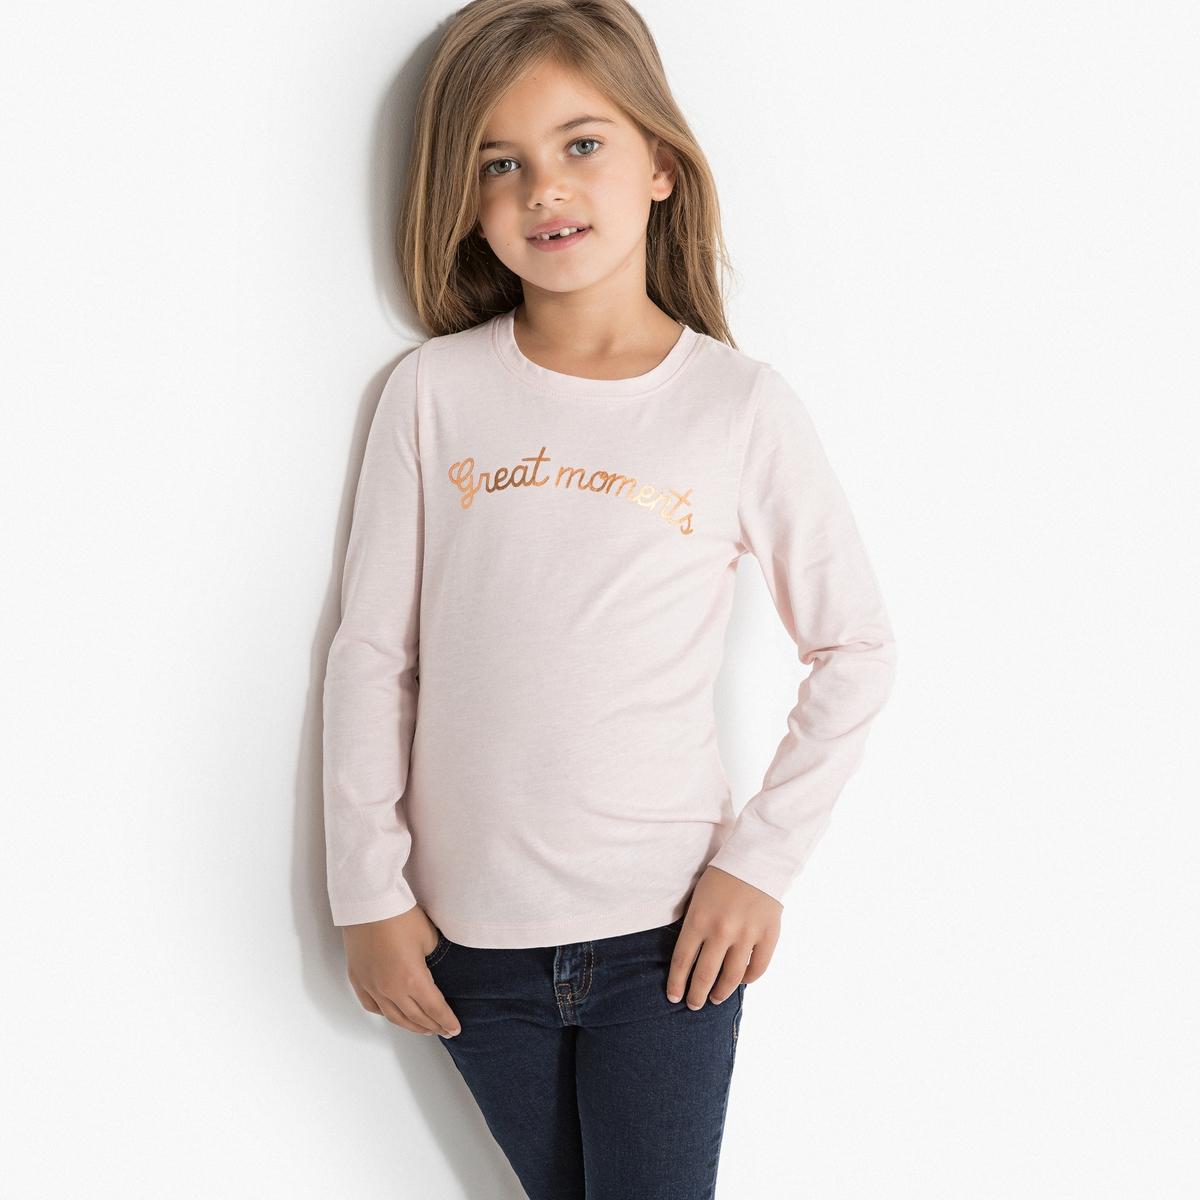 Confezione da 3 t-shirt maniche lunghe 3 - 12 anni